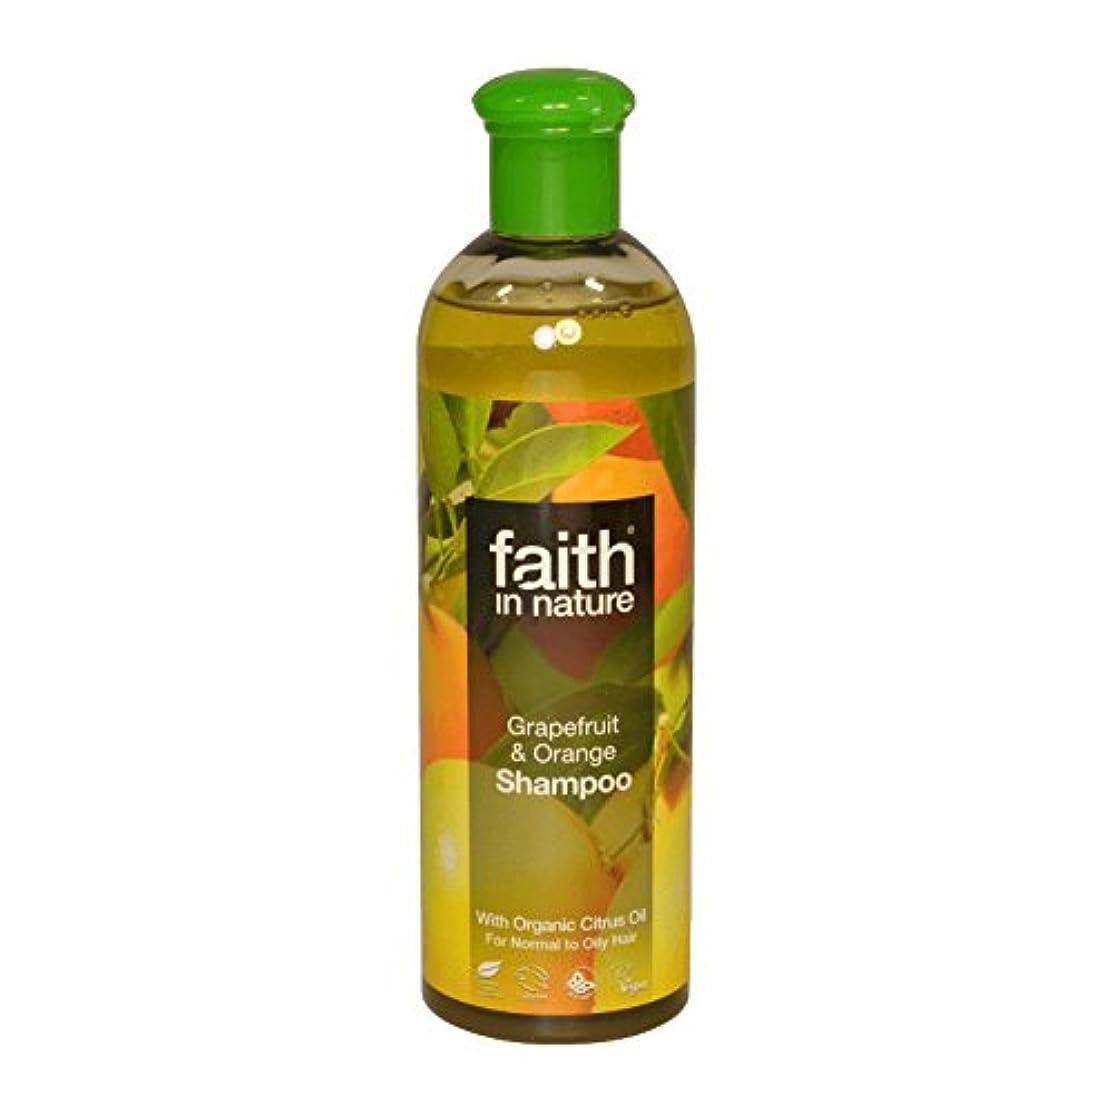 Faith in Nature Grapefruit & Orange Shampoo 400ml (Pack of 6) - 自然グレープフルーツ&オレンジシャンプー400ミリリットルの信仰 (x6) [並行輸入品]